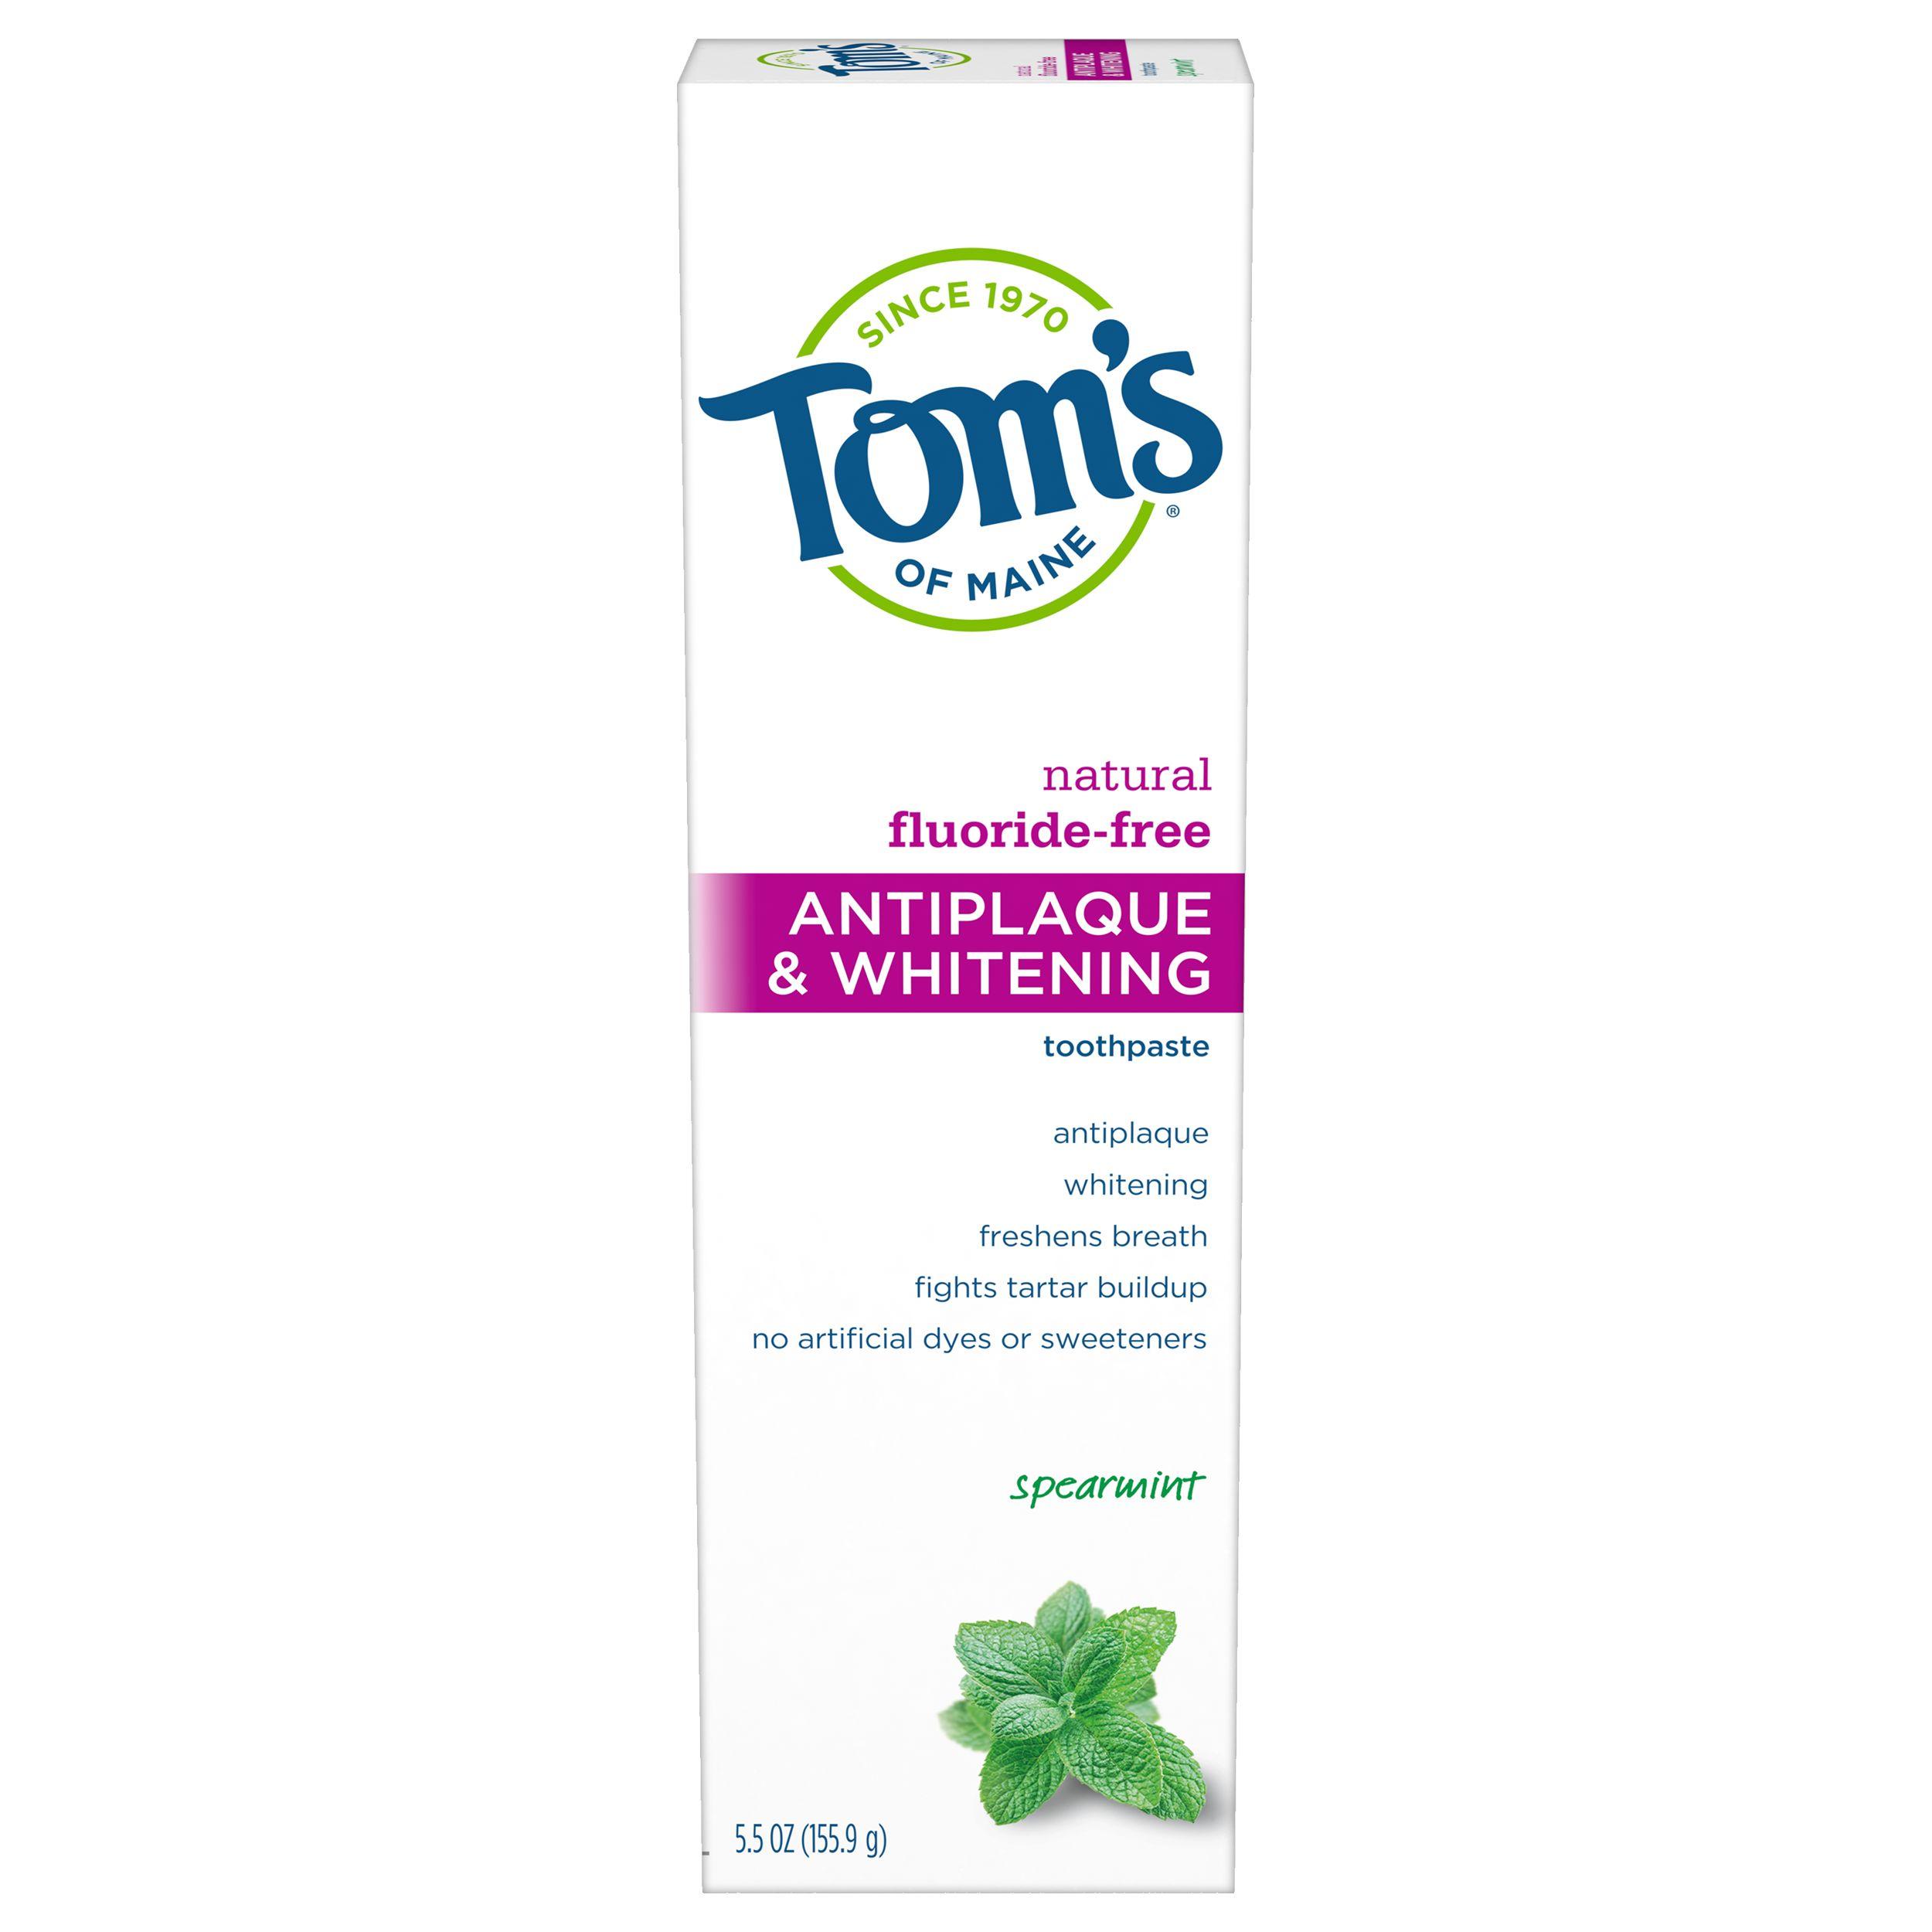 Toms Of Maine Tartar Control+Whitening Spearmint Fluoride Free Toothpaste (6x55 Oz)